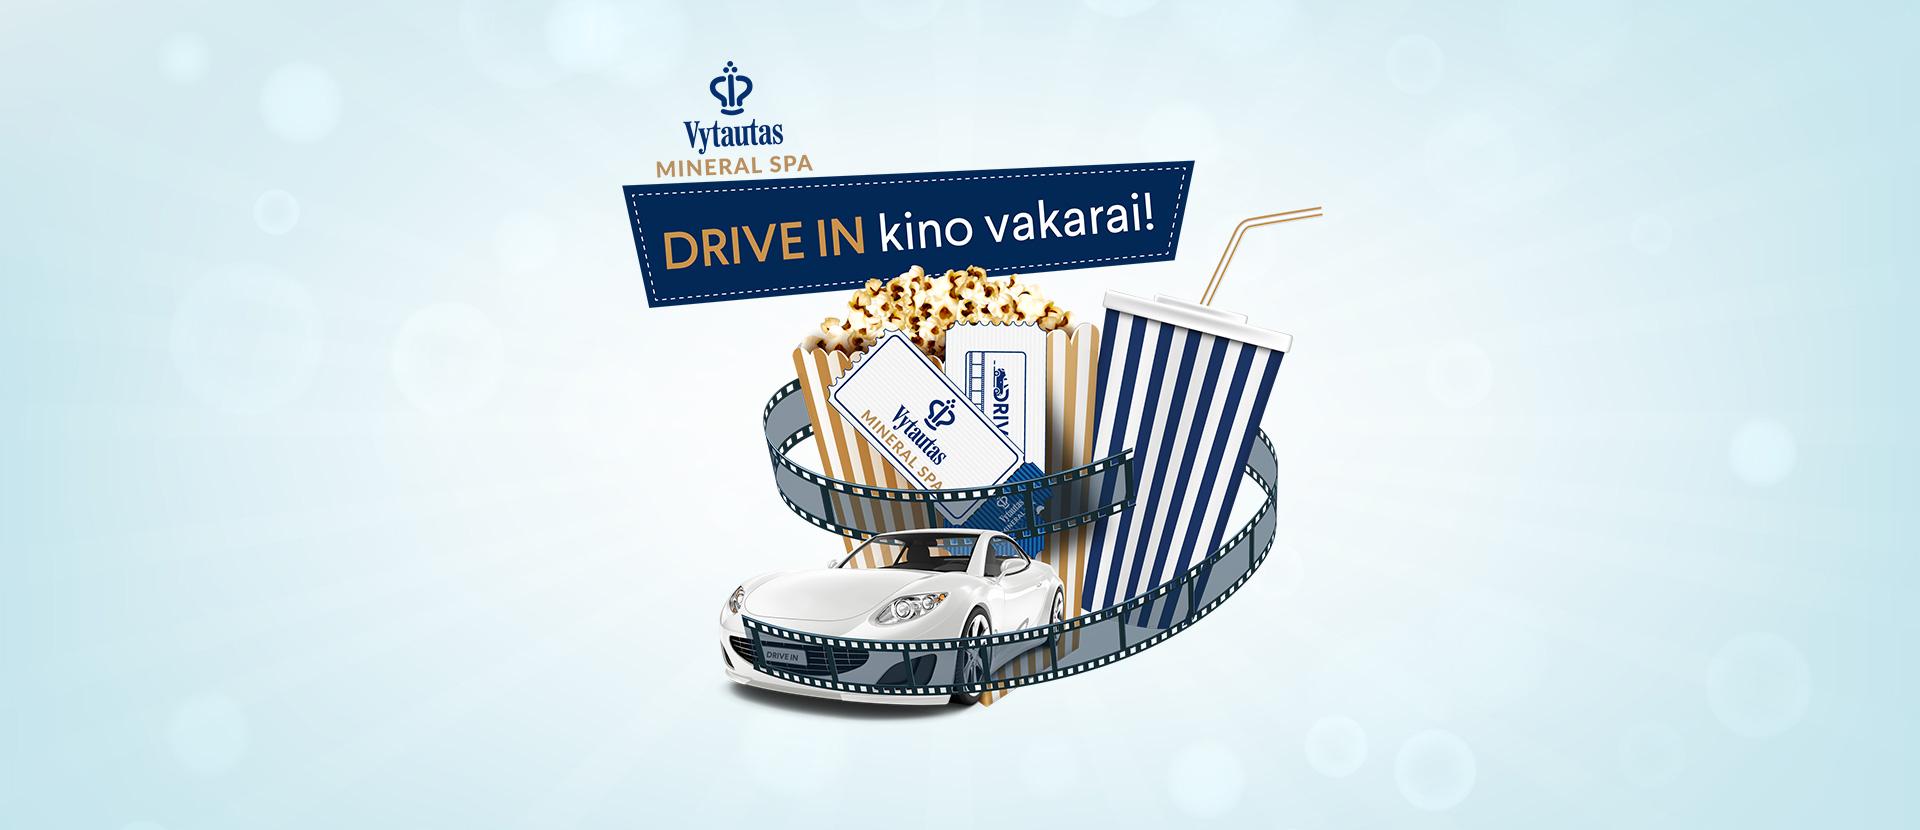 "DRIVE IN kino vakaras ""Vytautas Mineral SPA"""